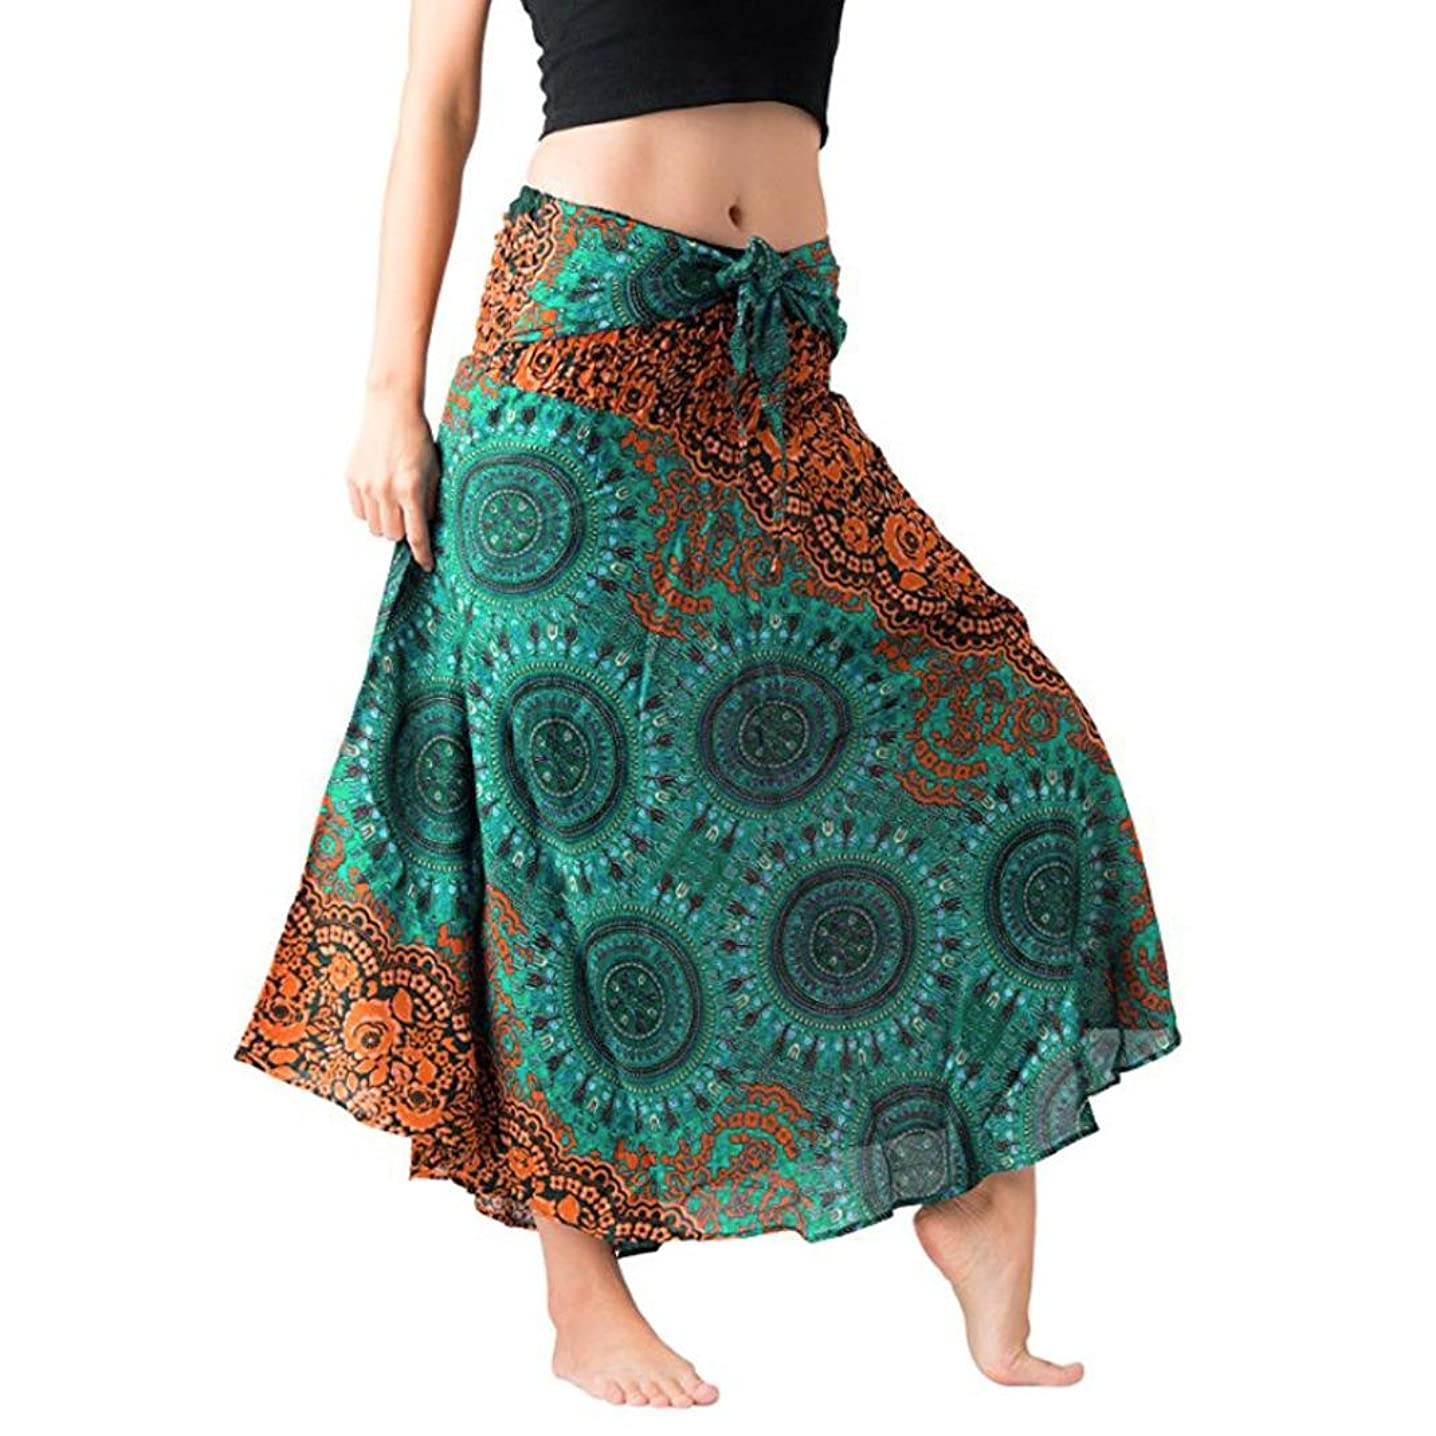 TOPUNDER Maxi Skirts for Women Long Hippie Bohemian Gypsy Boho Flowers Elastic Hlater Skirt